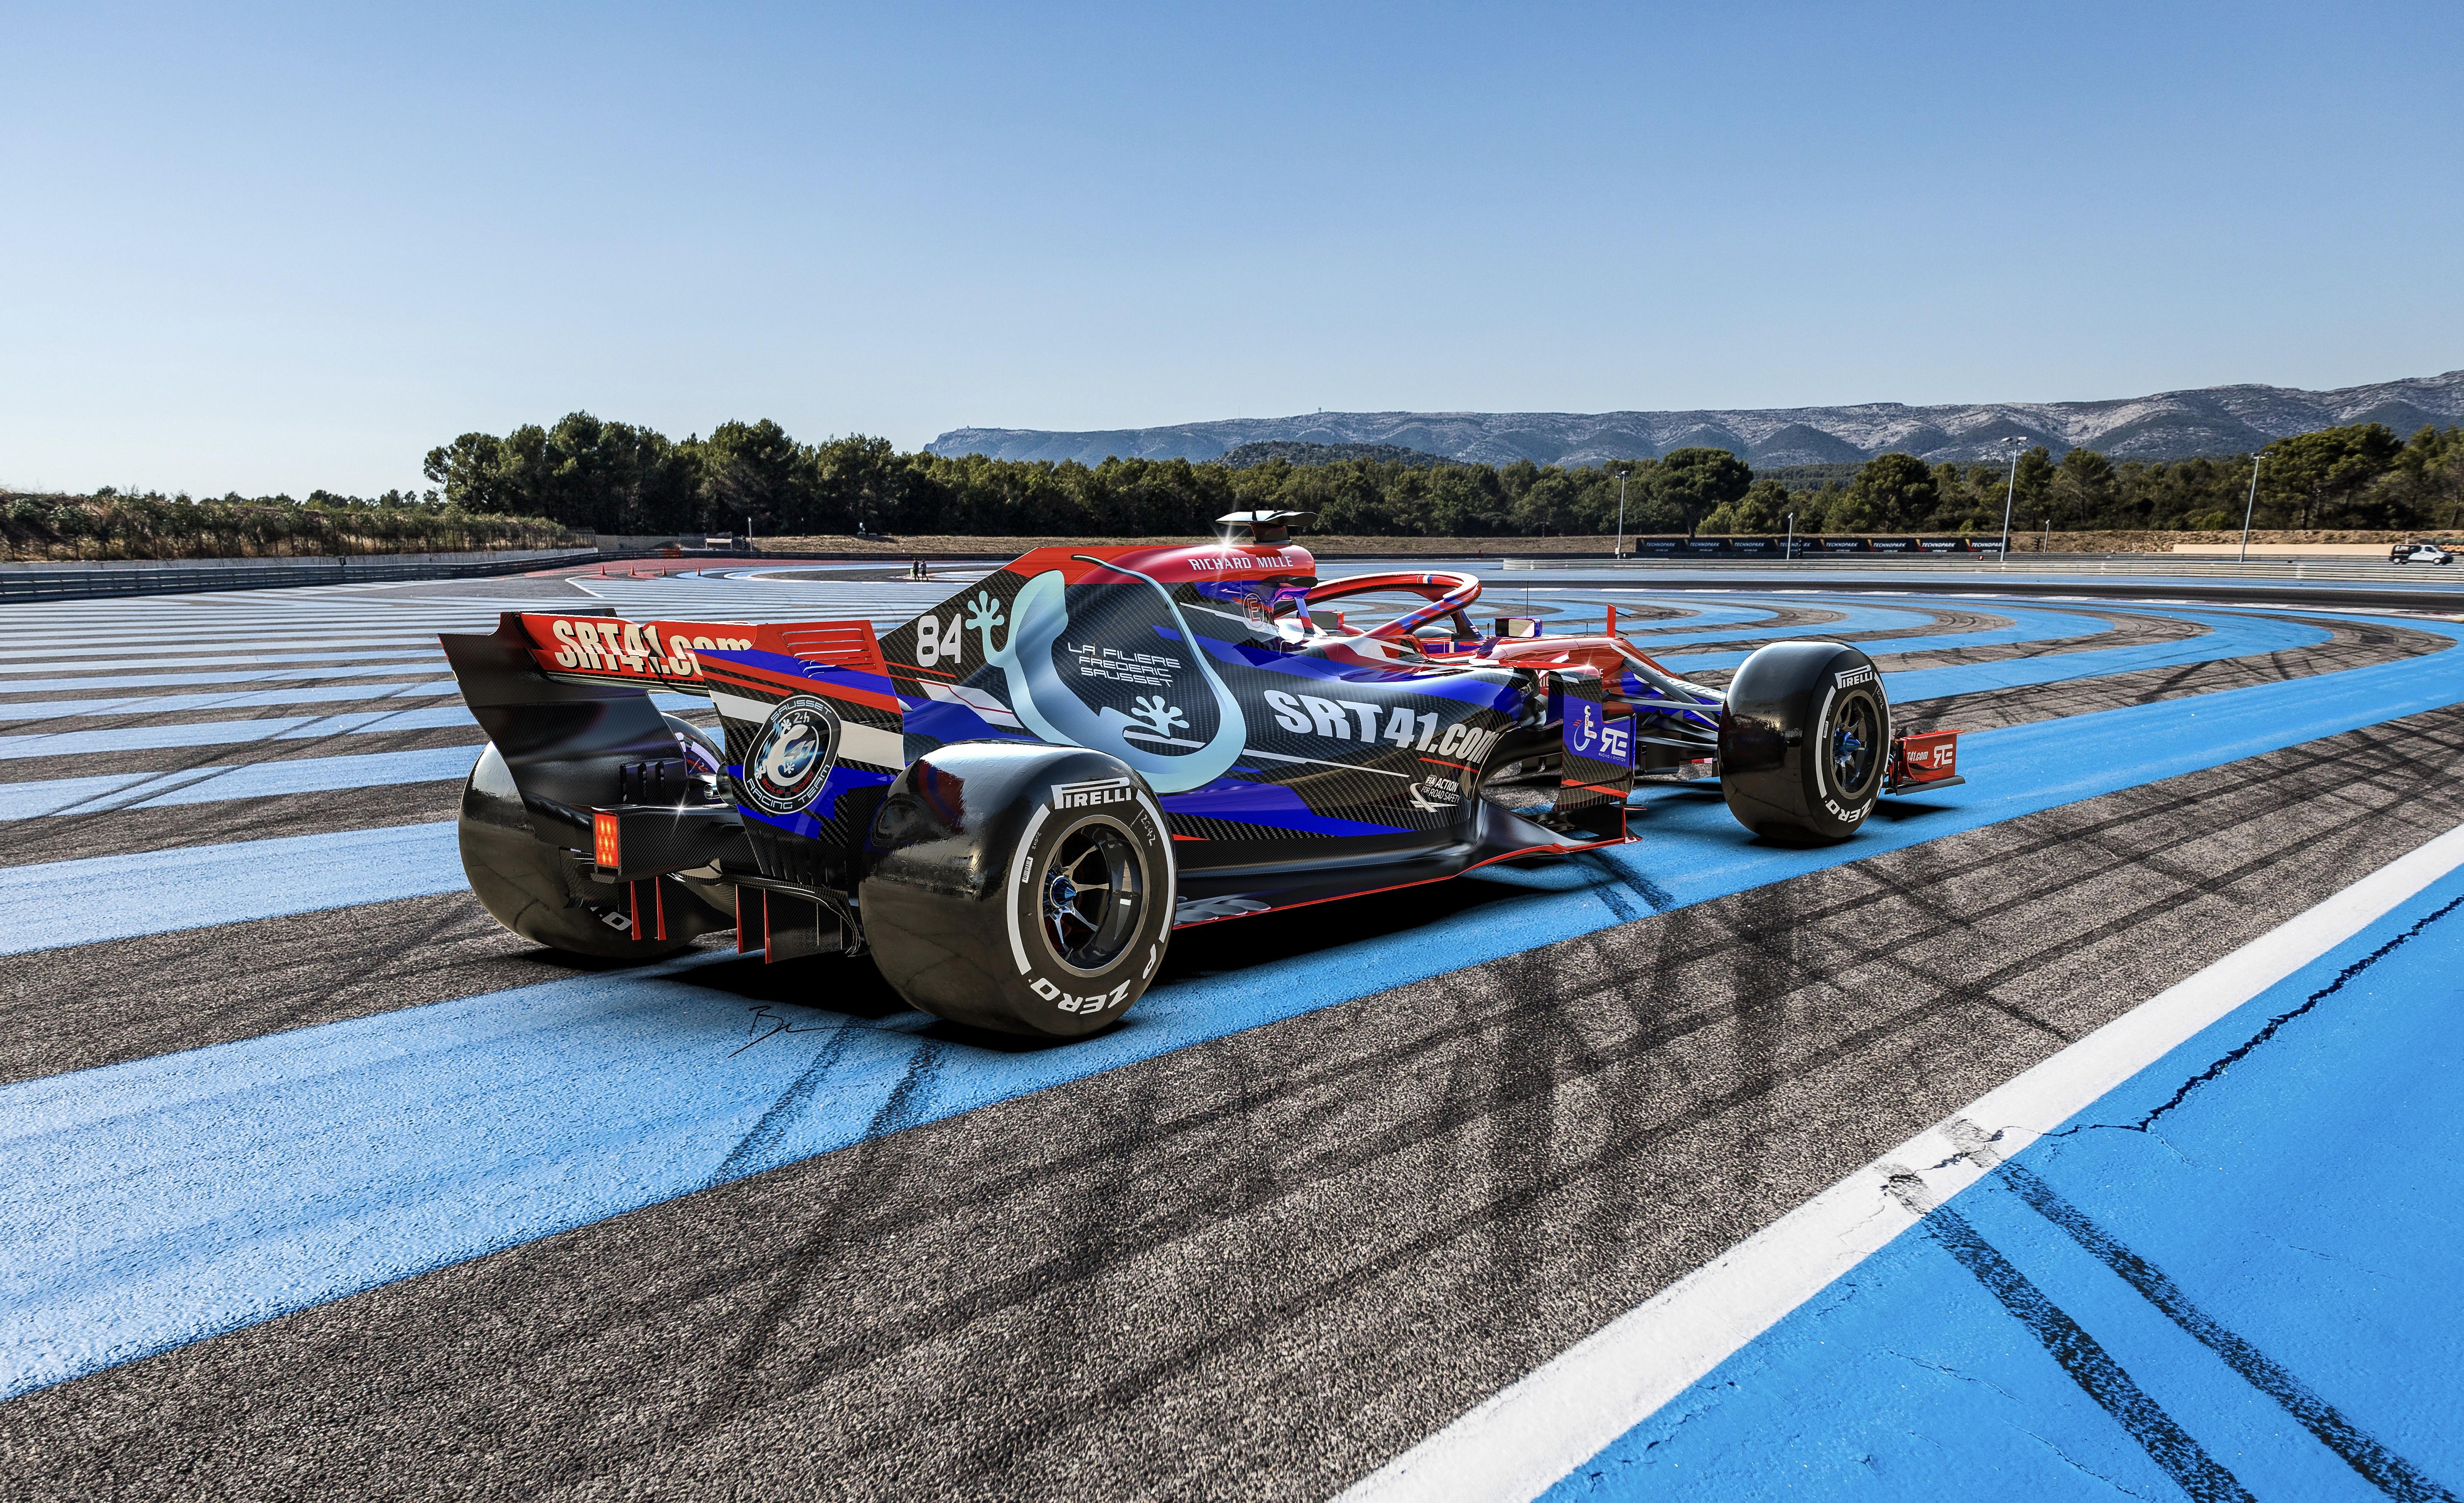 SRT41_F1 2020 design By Benoit Fraylon